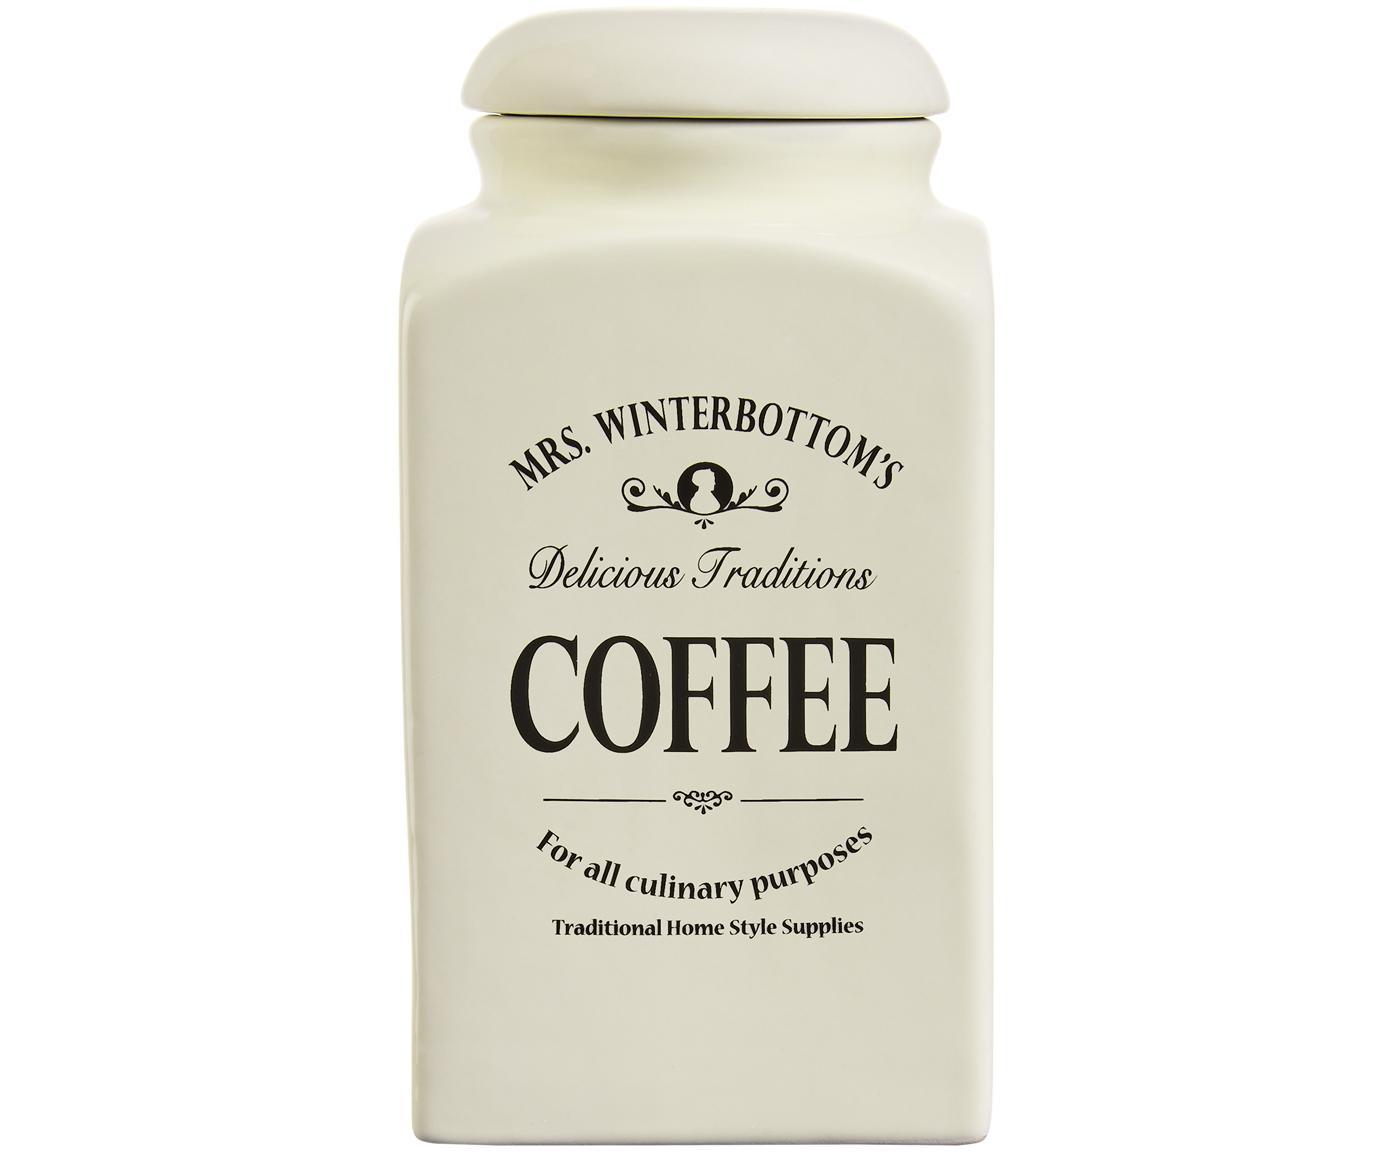 Opbergpot Mrs Winterbottoms Coffee, Keramiek, Crèmekleurig, zwart, 11 x 21 cm